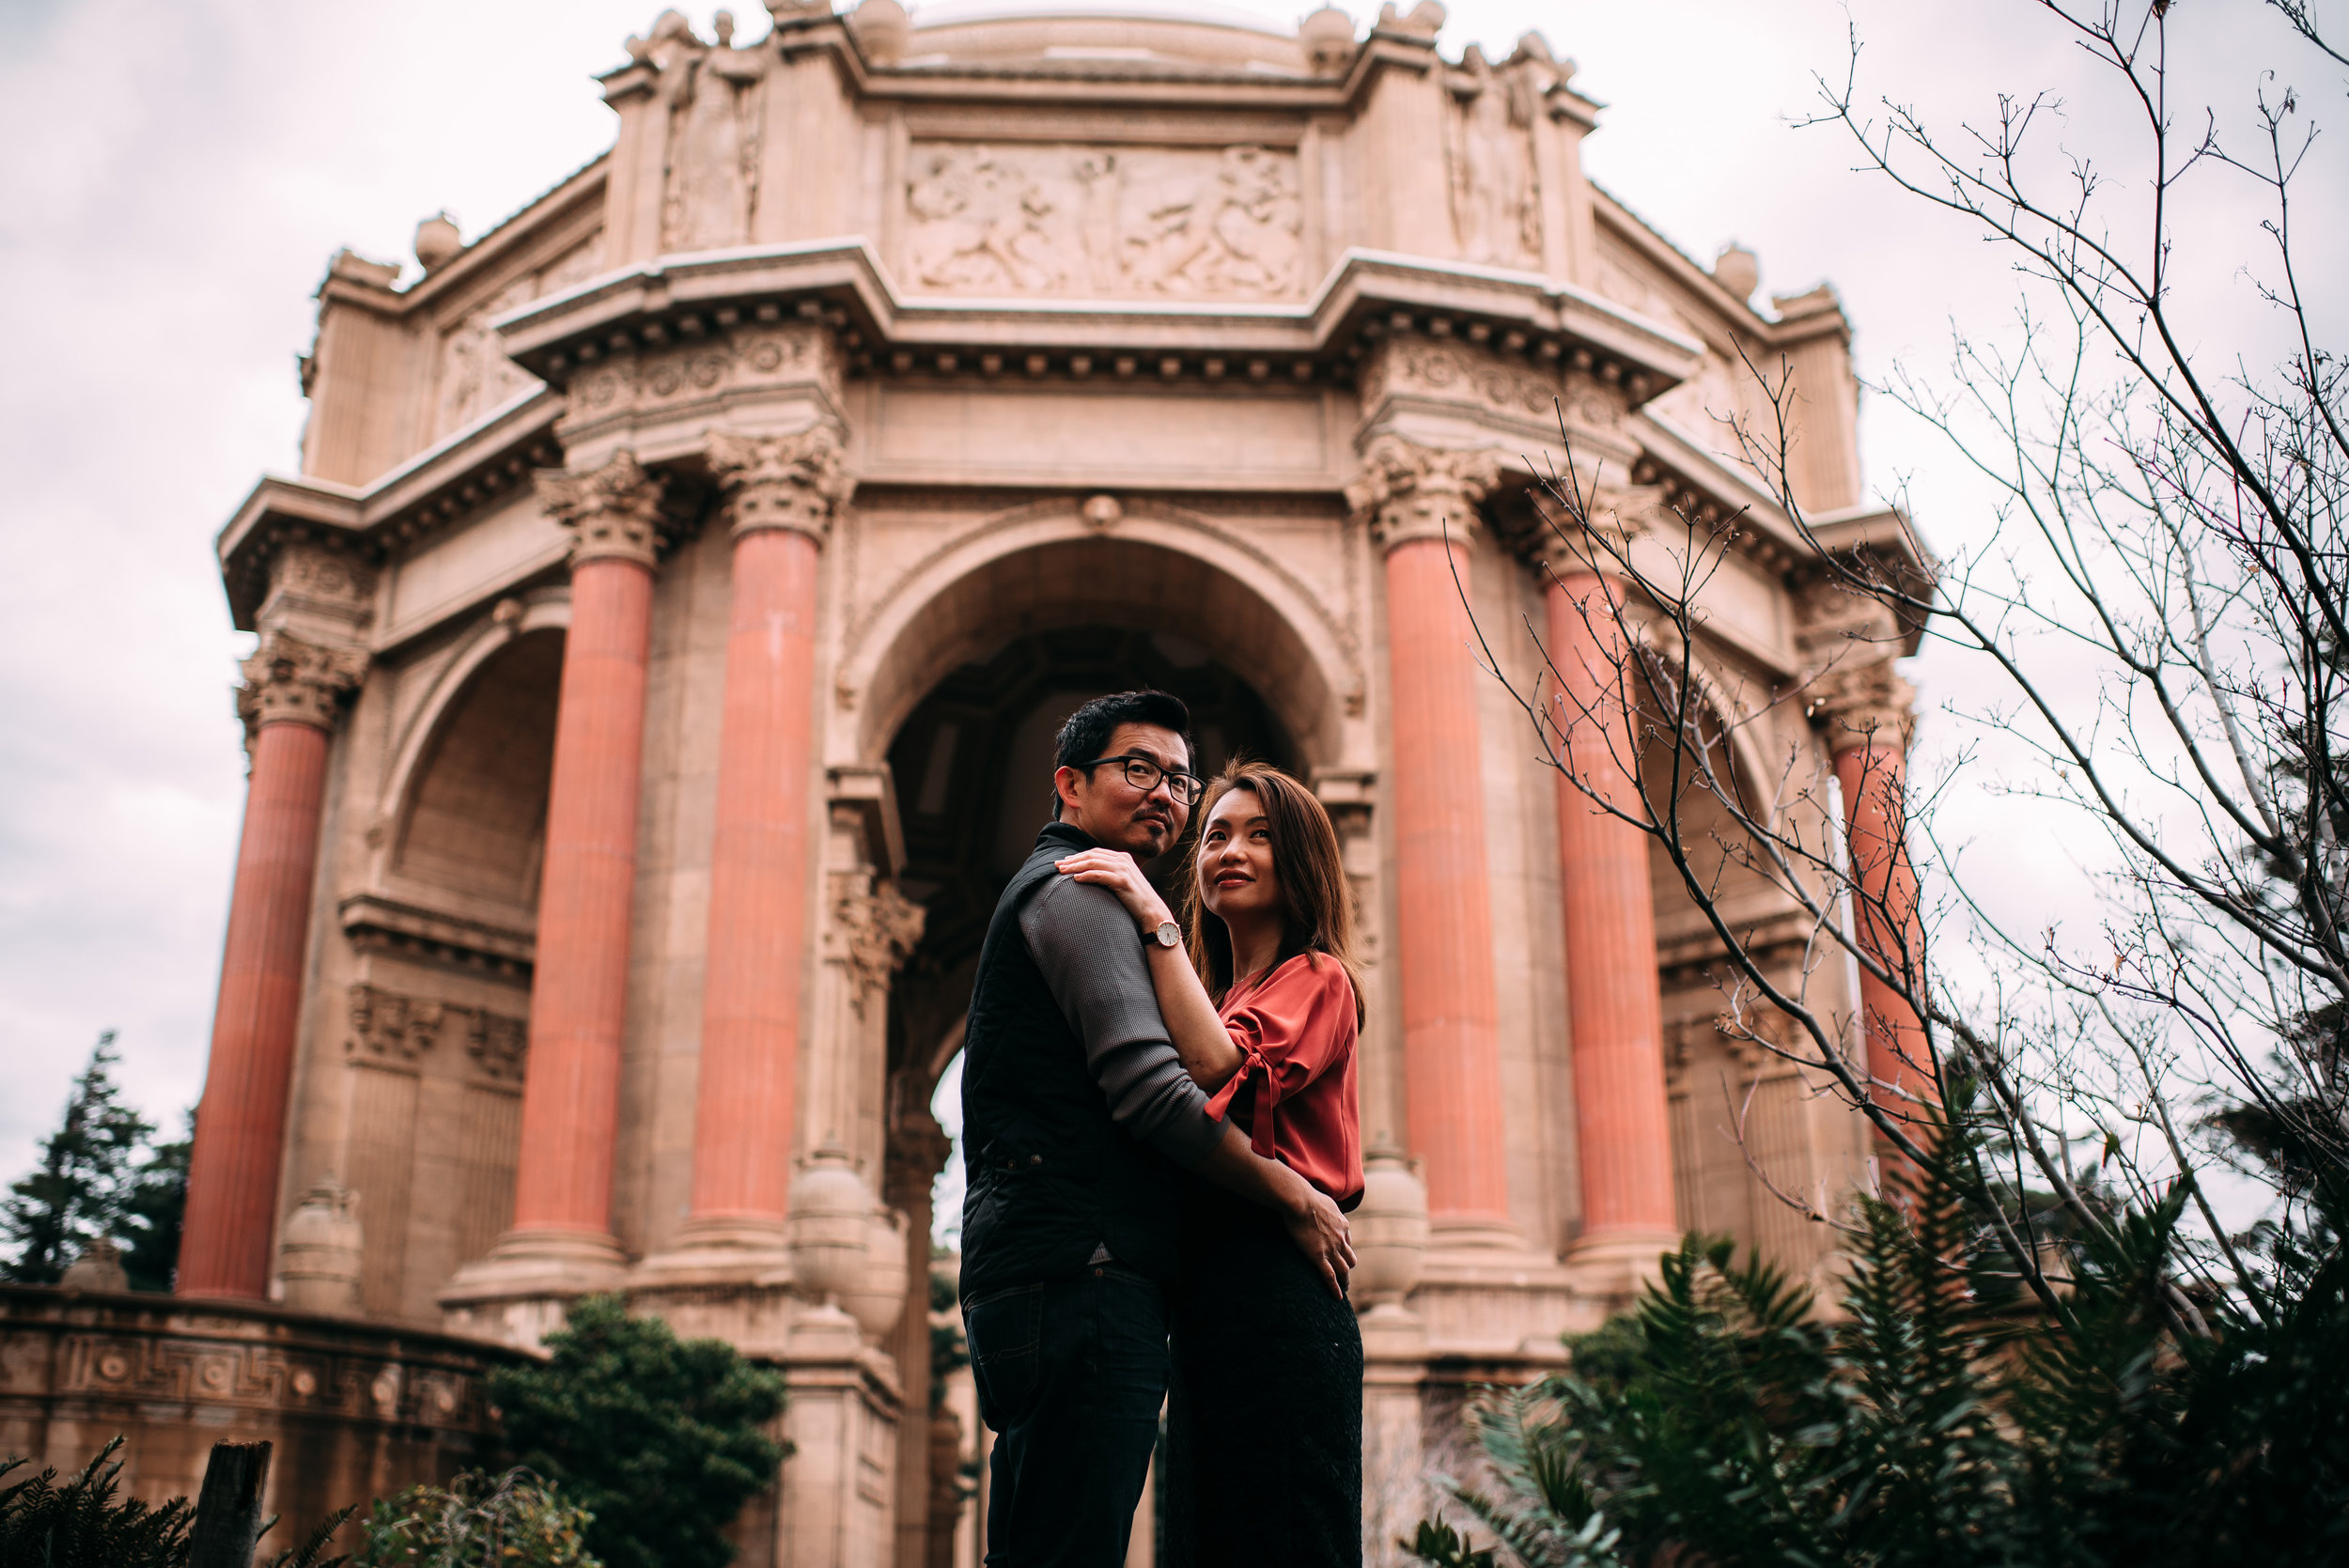 san francisco wedding photographer - san francisco engagement photographer - palace of fine arts engagement